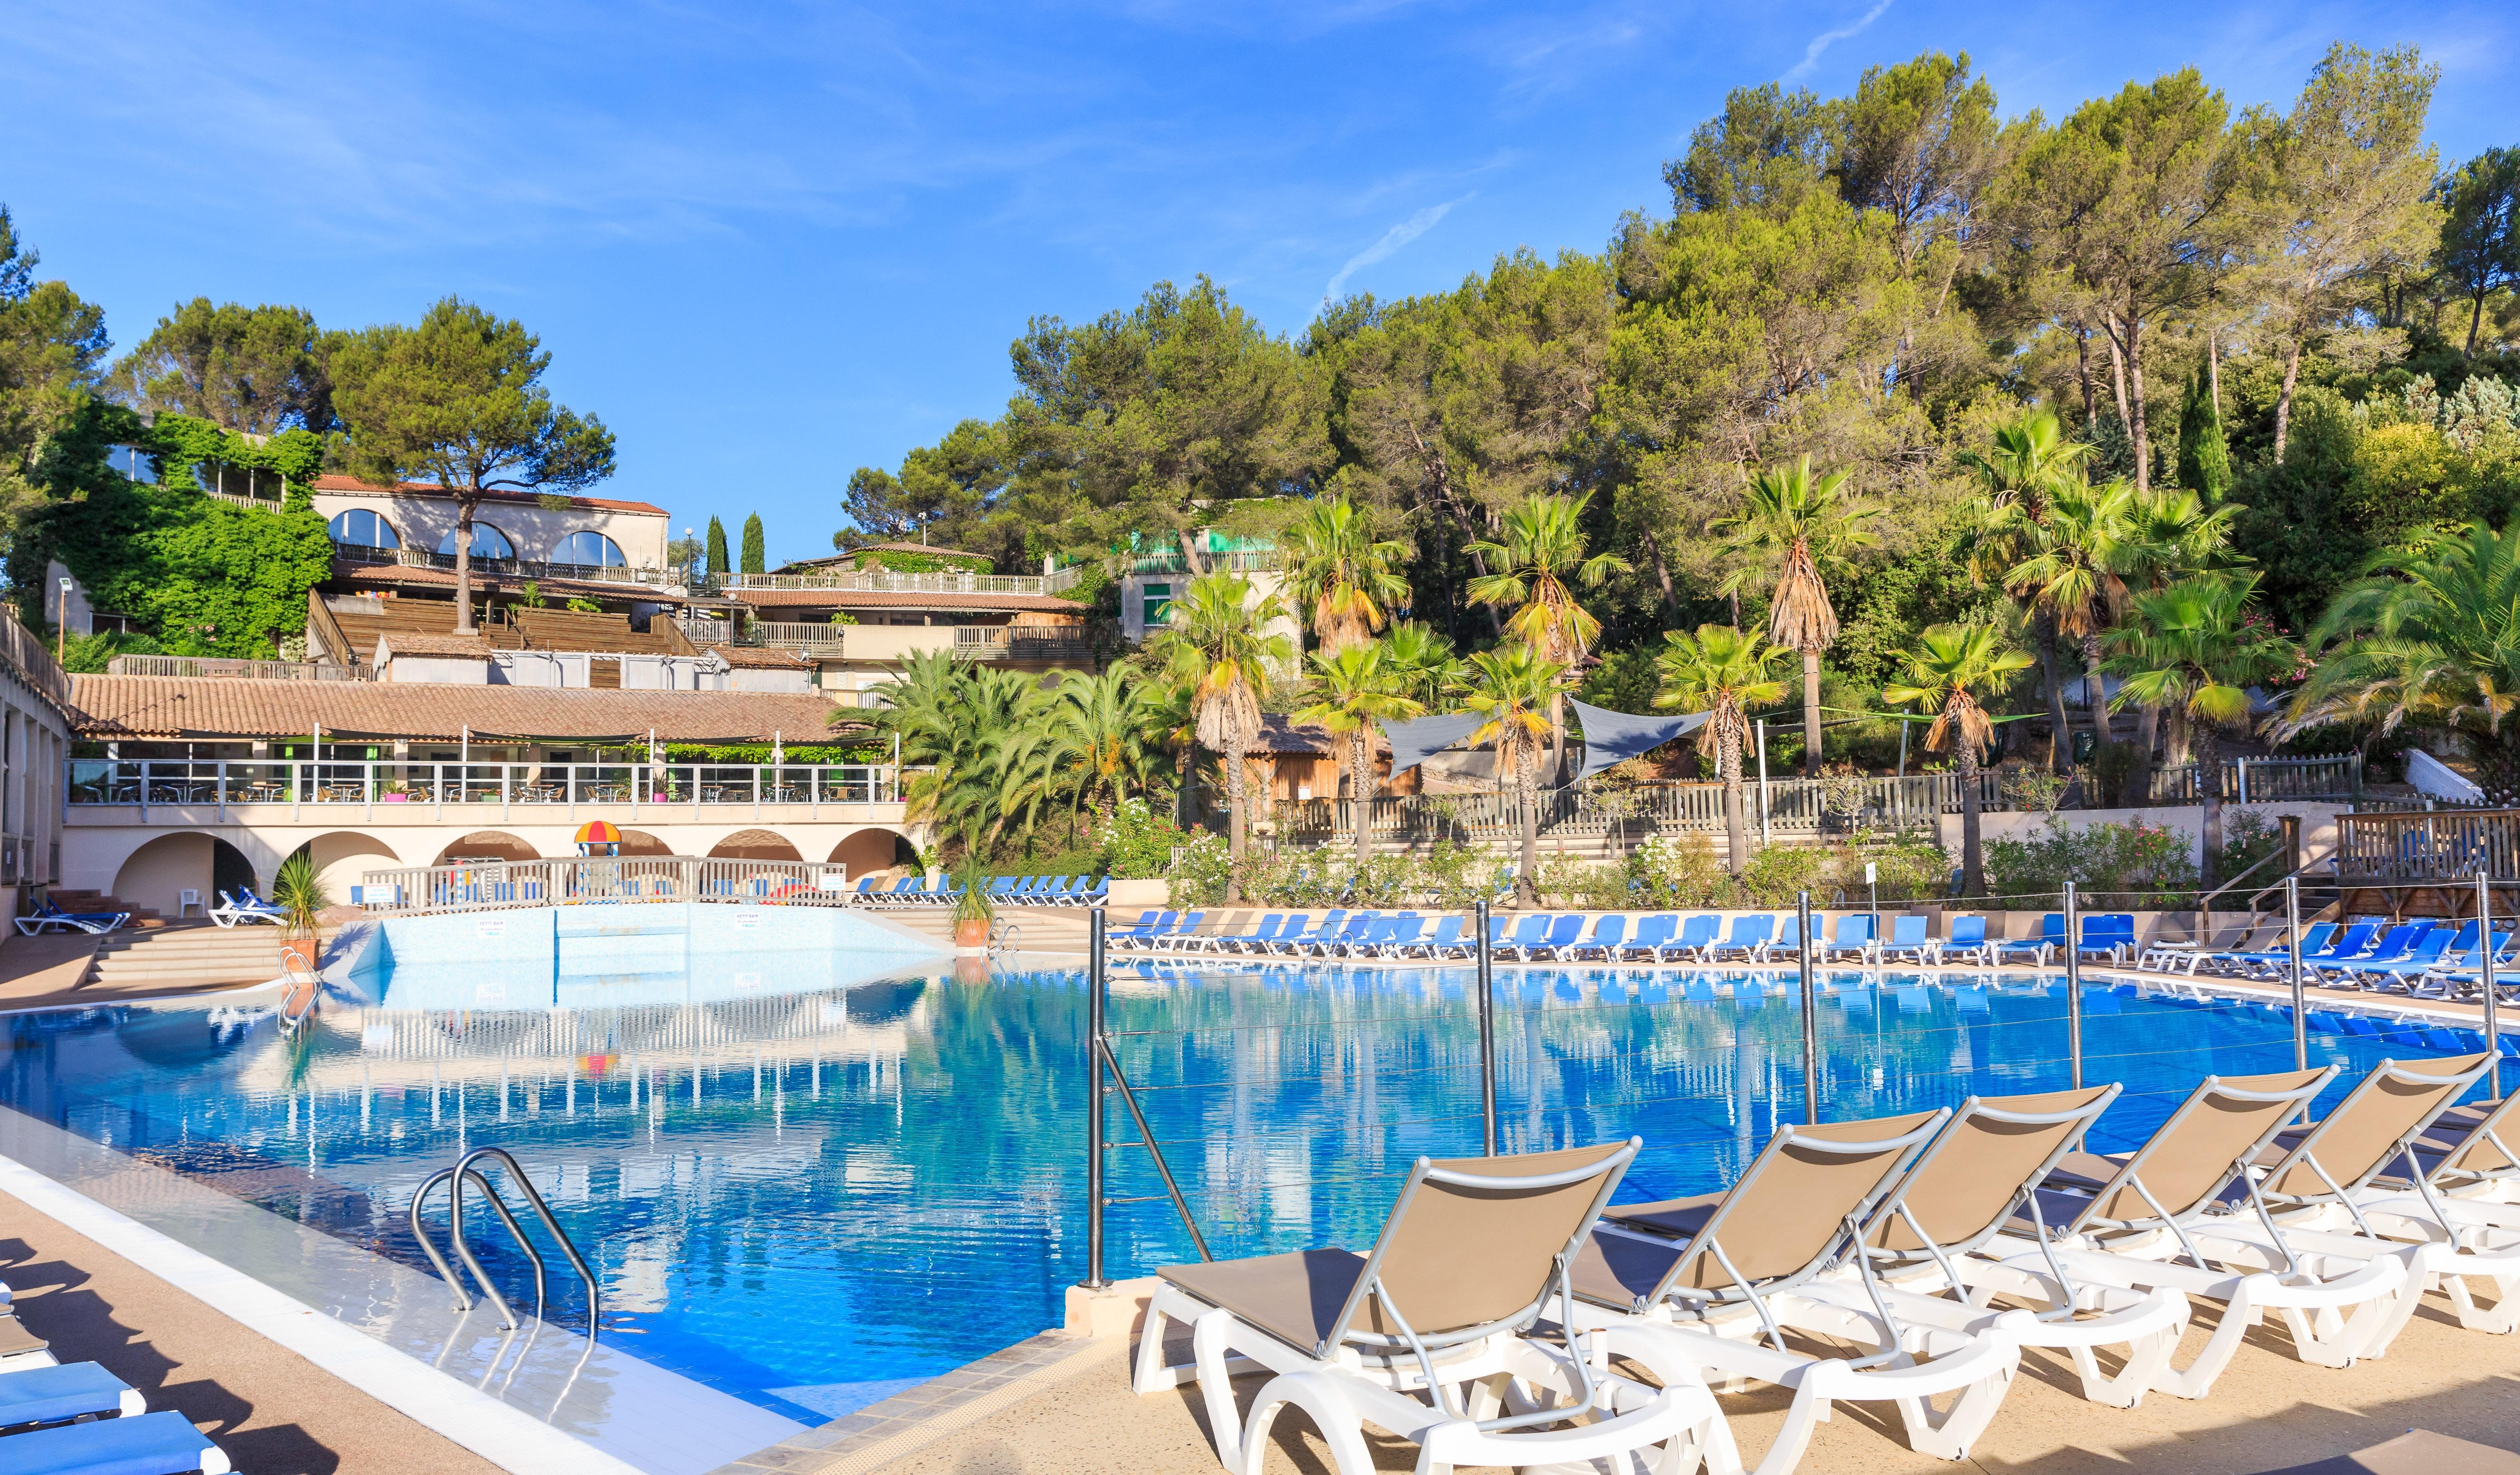 La Provence au Sunélia Holiday Green, à 7 km de Fréjus.